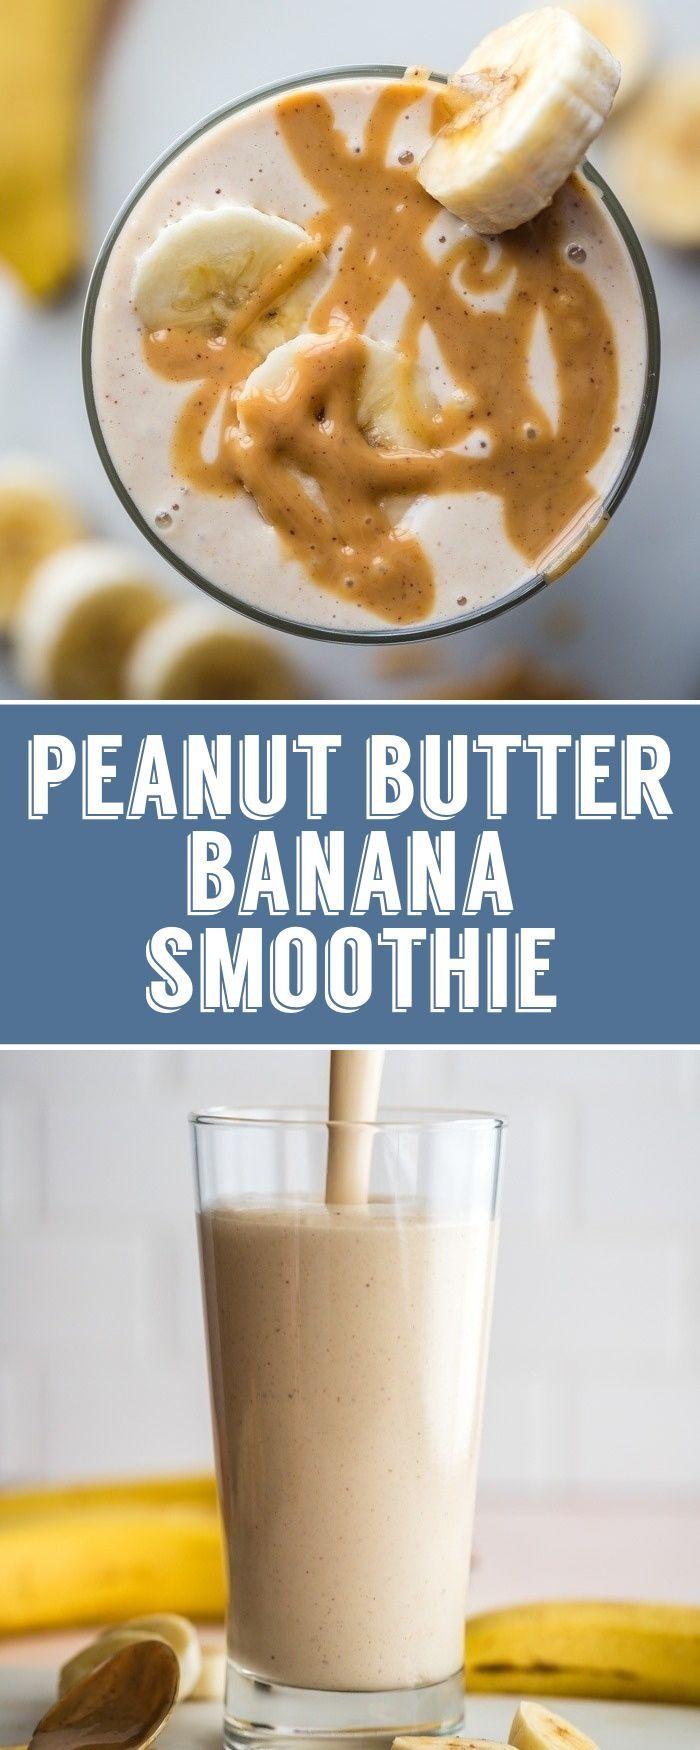 Erdnussbutter-Bananen-Smoothie – dieser Erdnussbut…